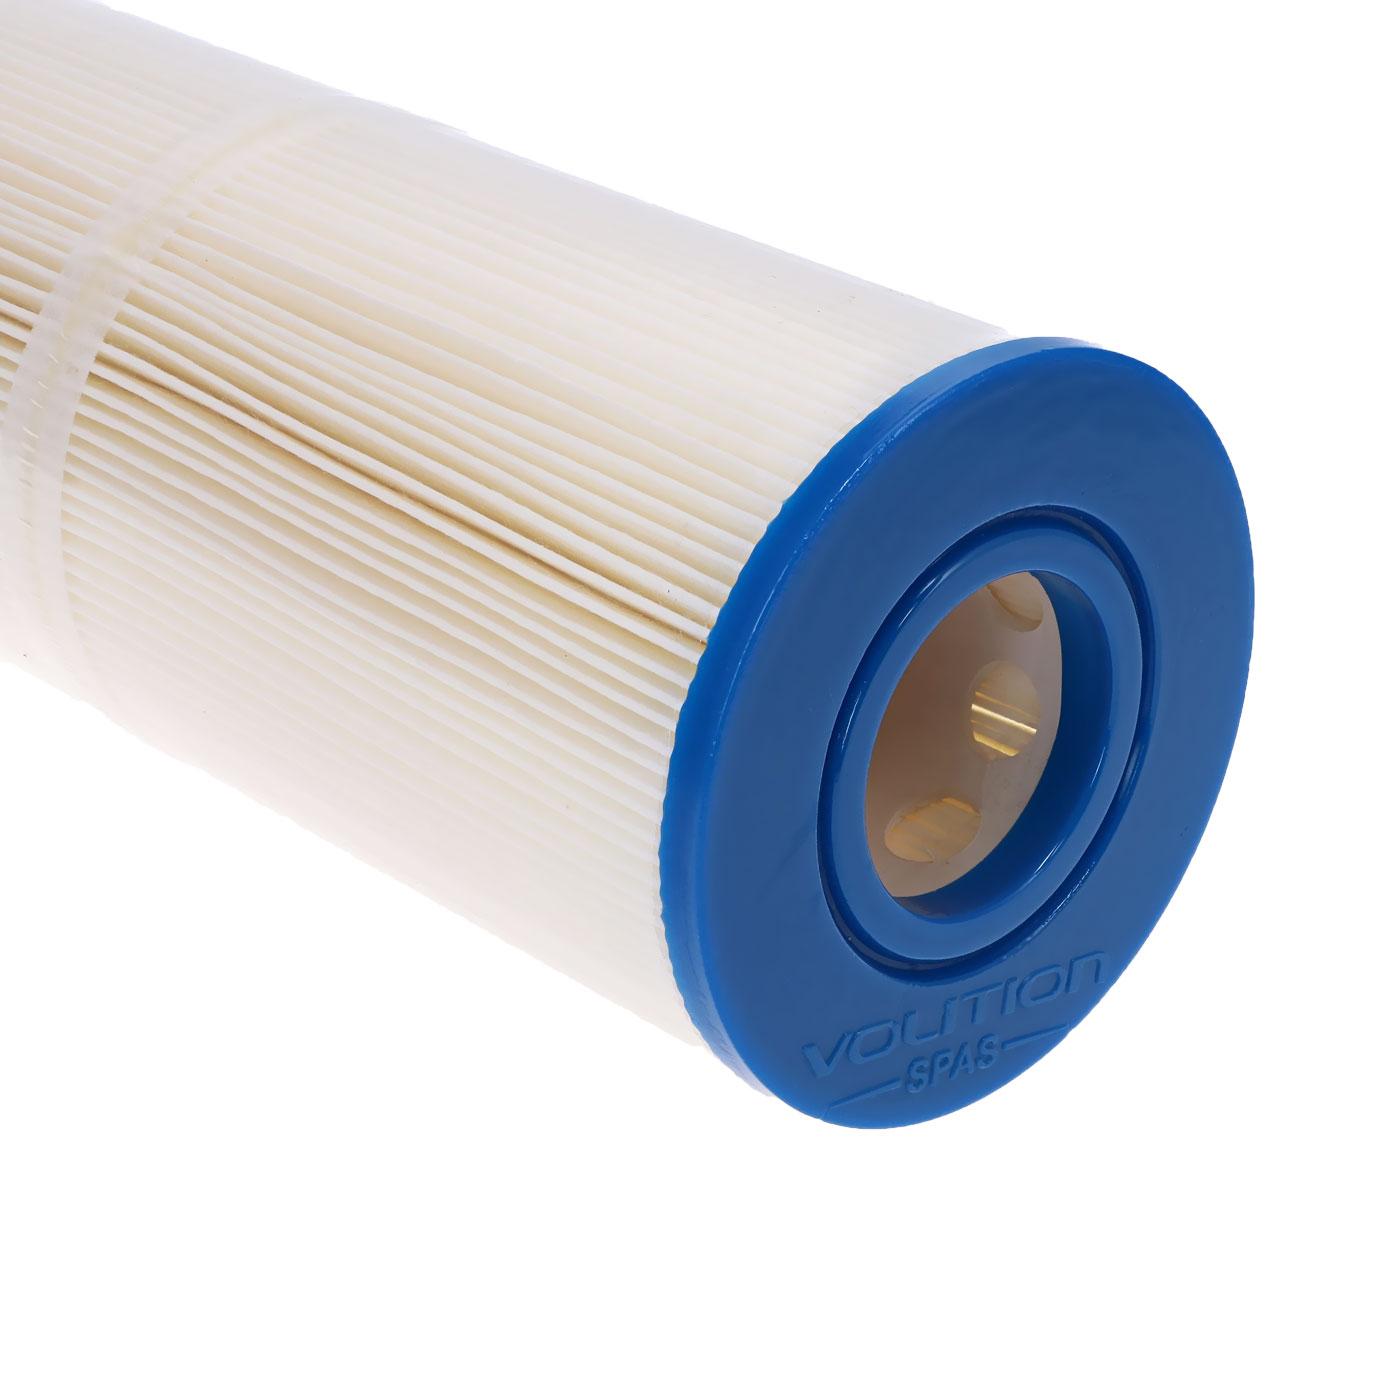 Filtre spa Eco (42513LW / C-4326 / PRB25-IN / FC-2375)